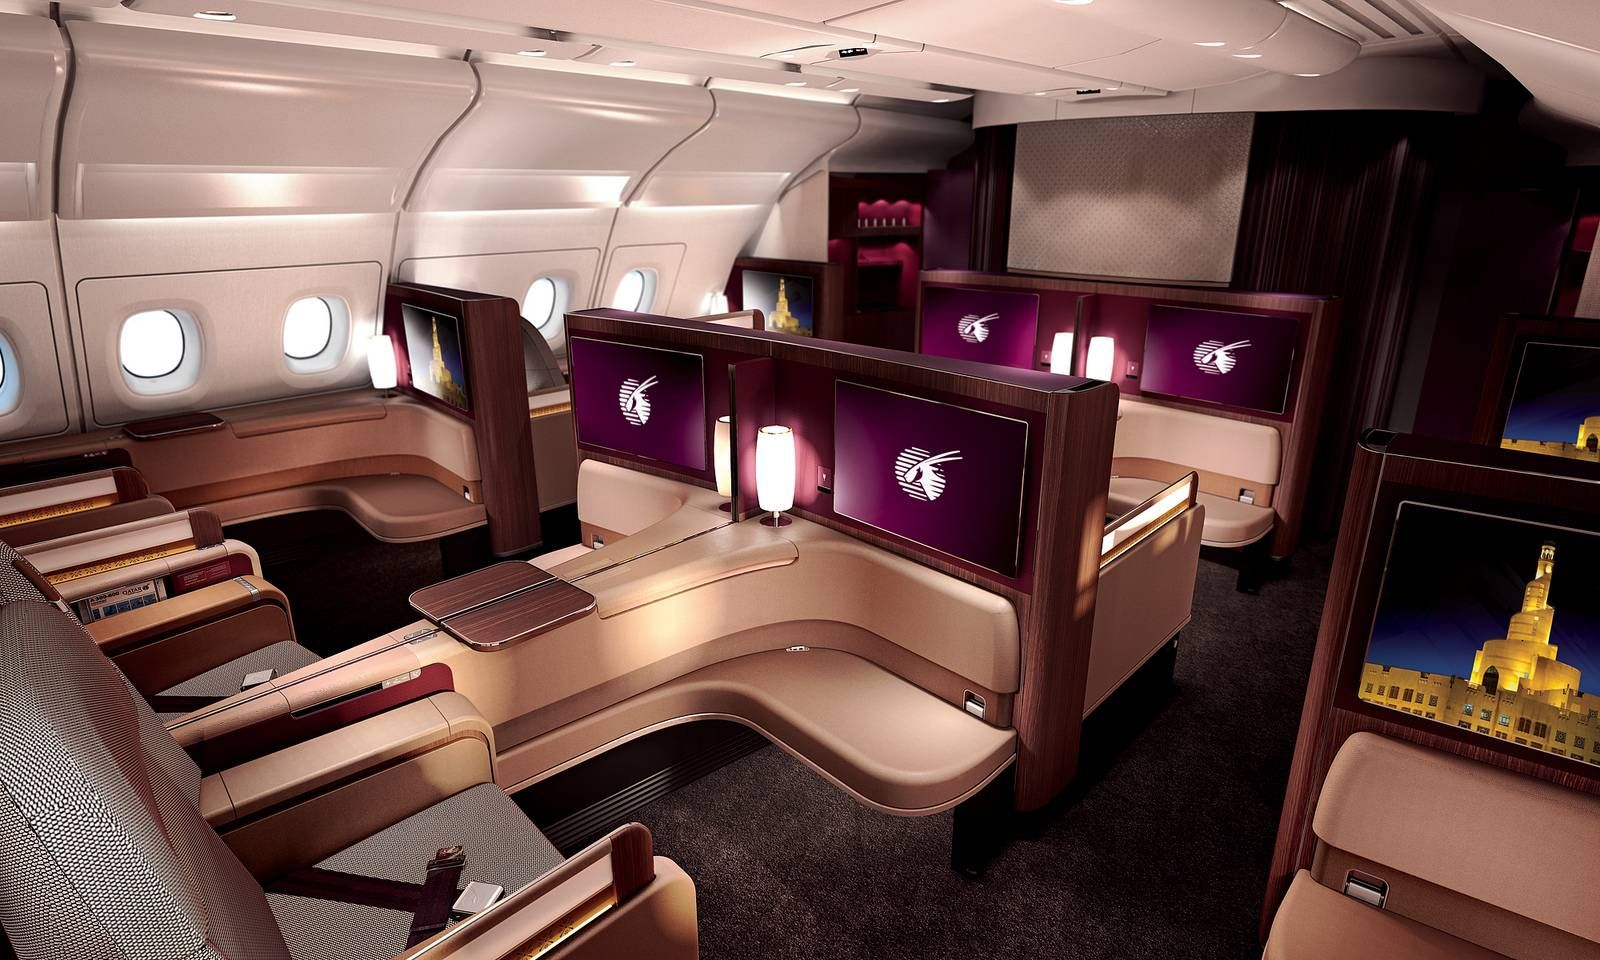 VOLTOU ! Voe na Primeira Classe da Lufthansa, British, Qatar ou Qantas por R$1.680,00